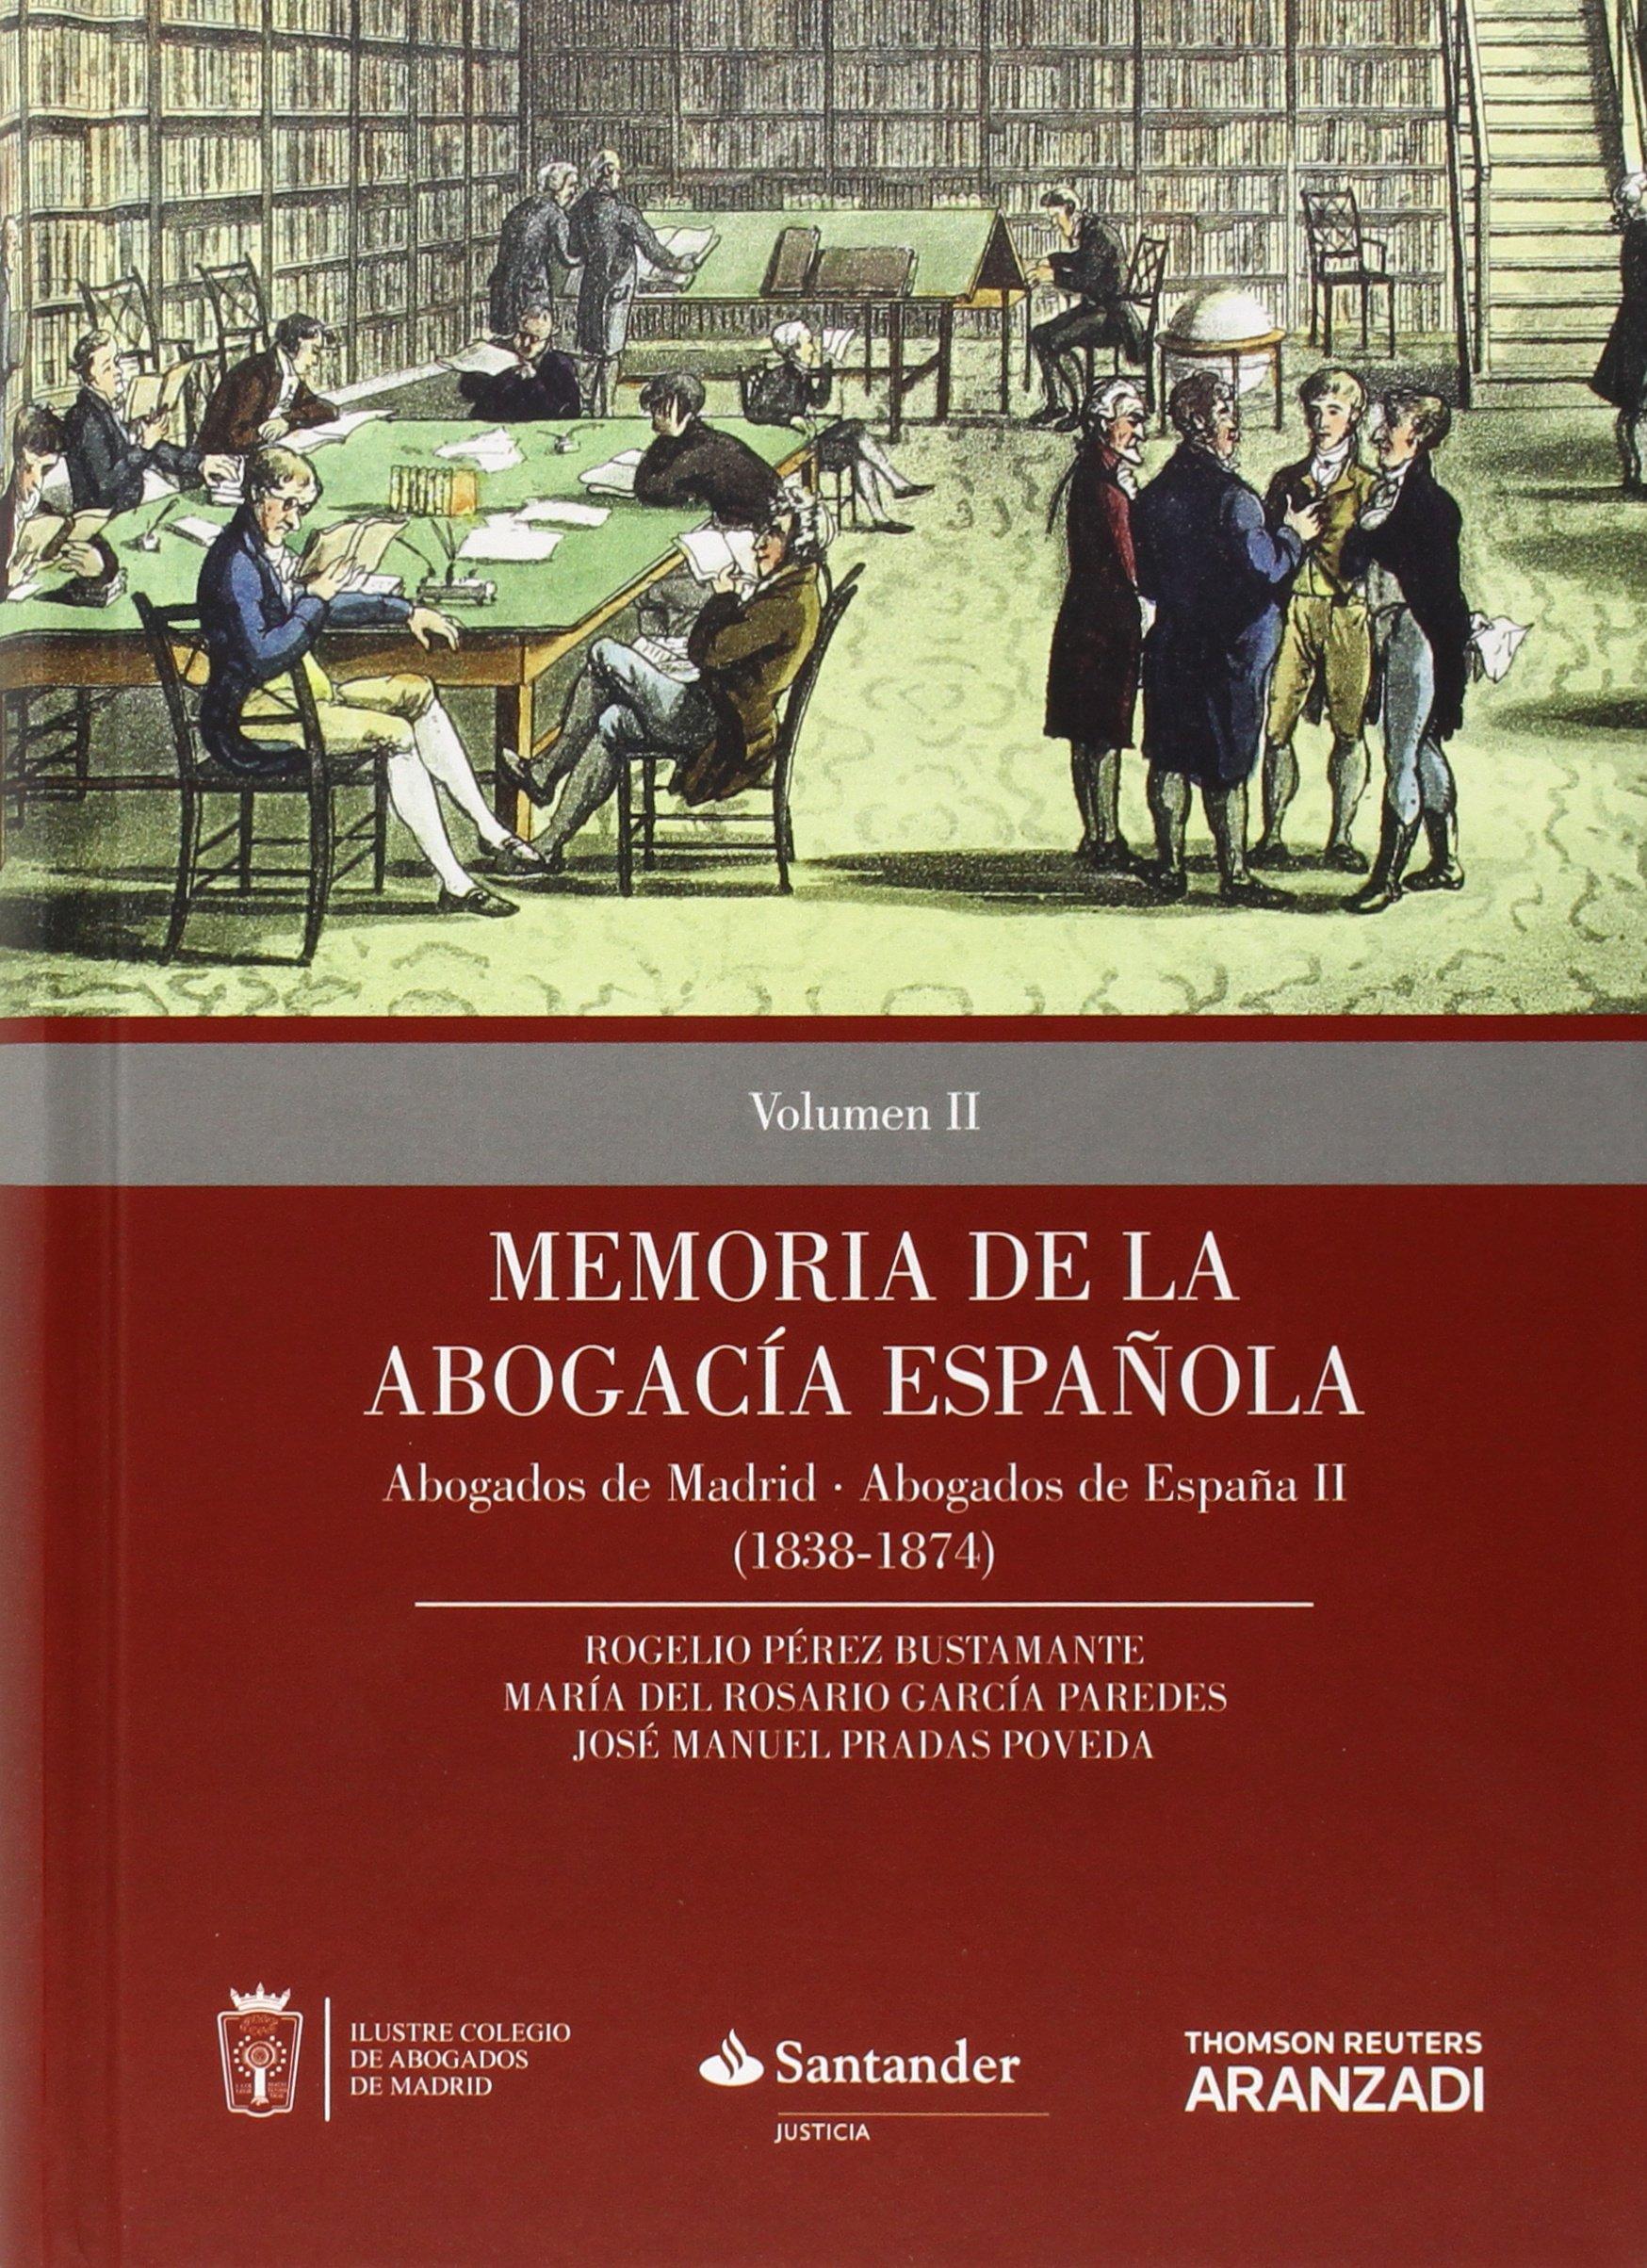 Memoria de la Abogacía Española: Abogados de Madrid, Abogados de ...